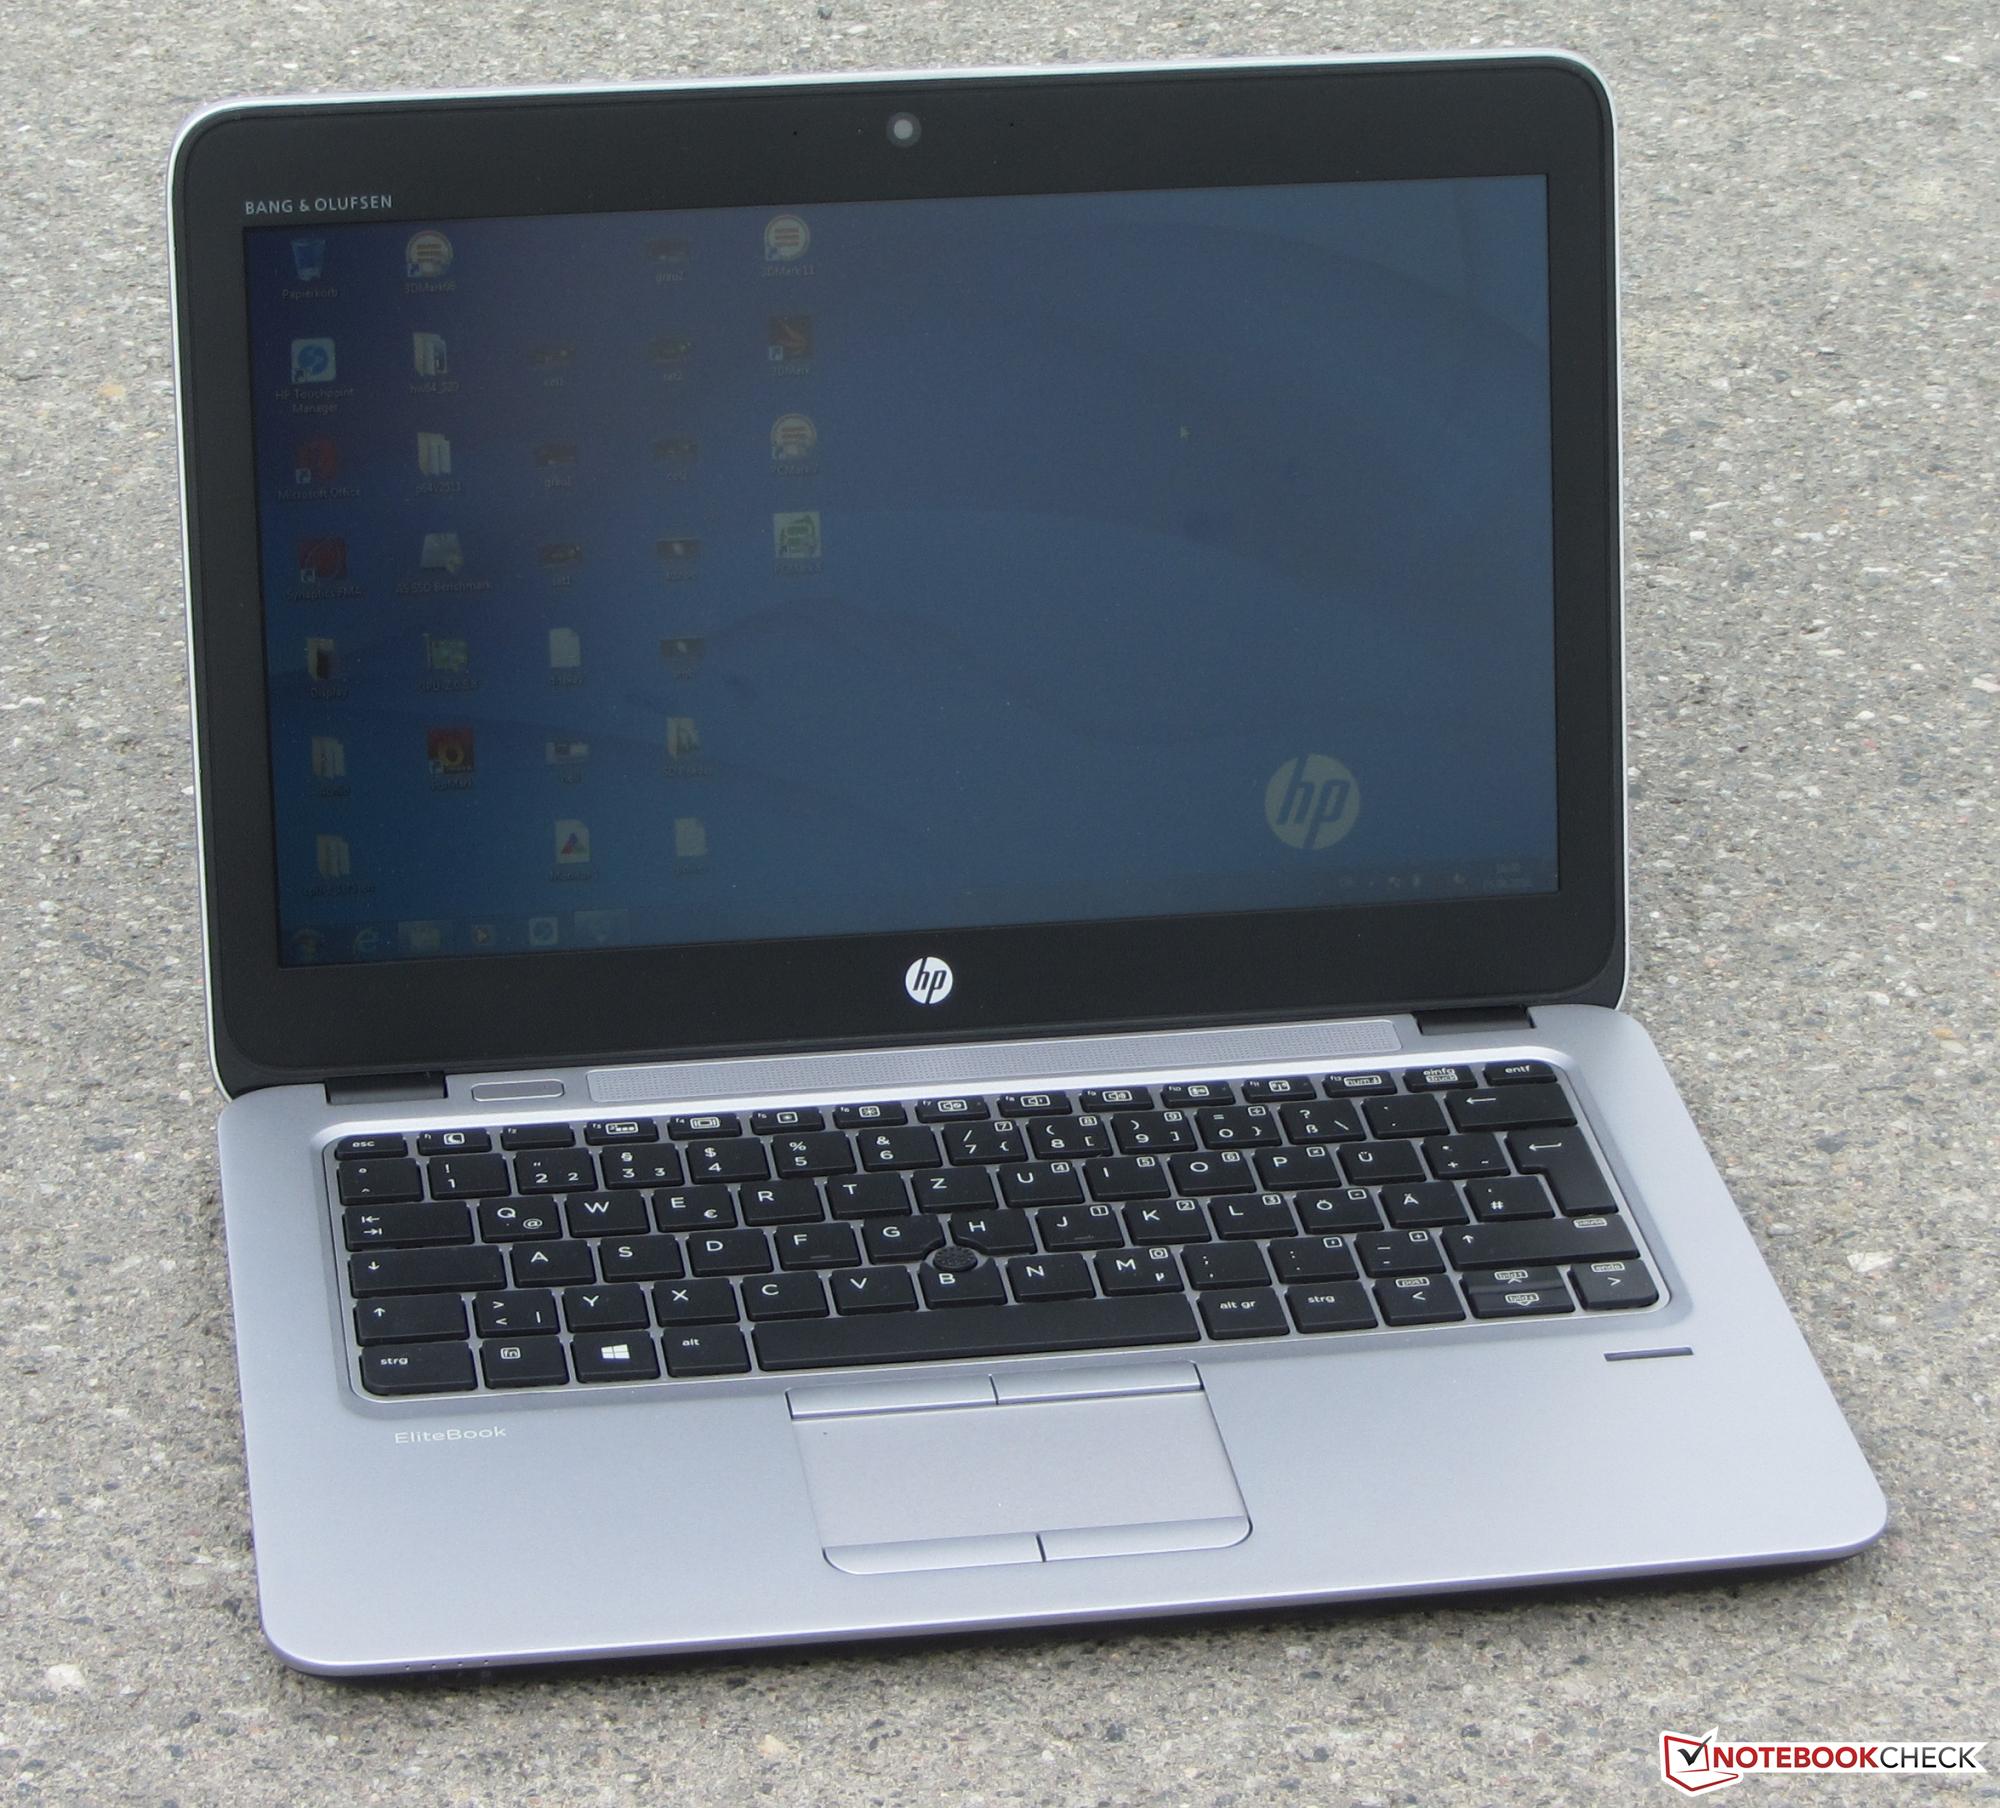 HP EliteBook 725 G3 Broadcom Ethernet Driver Windows XP